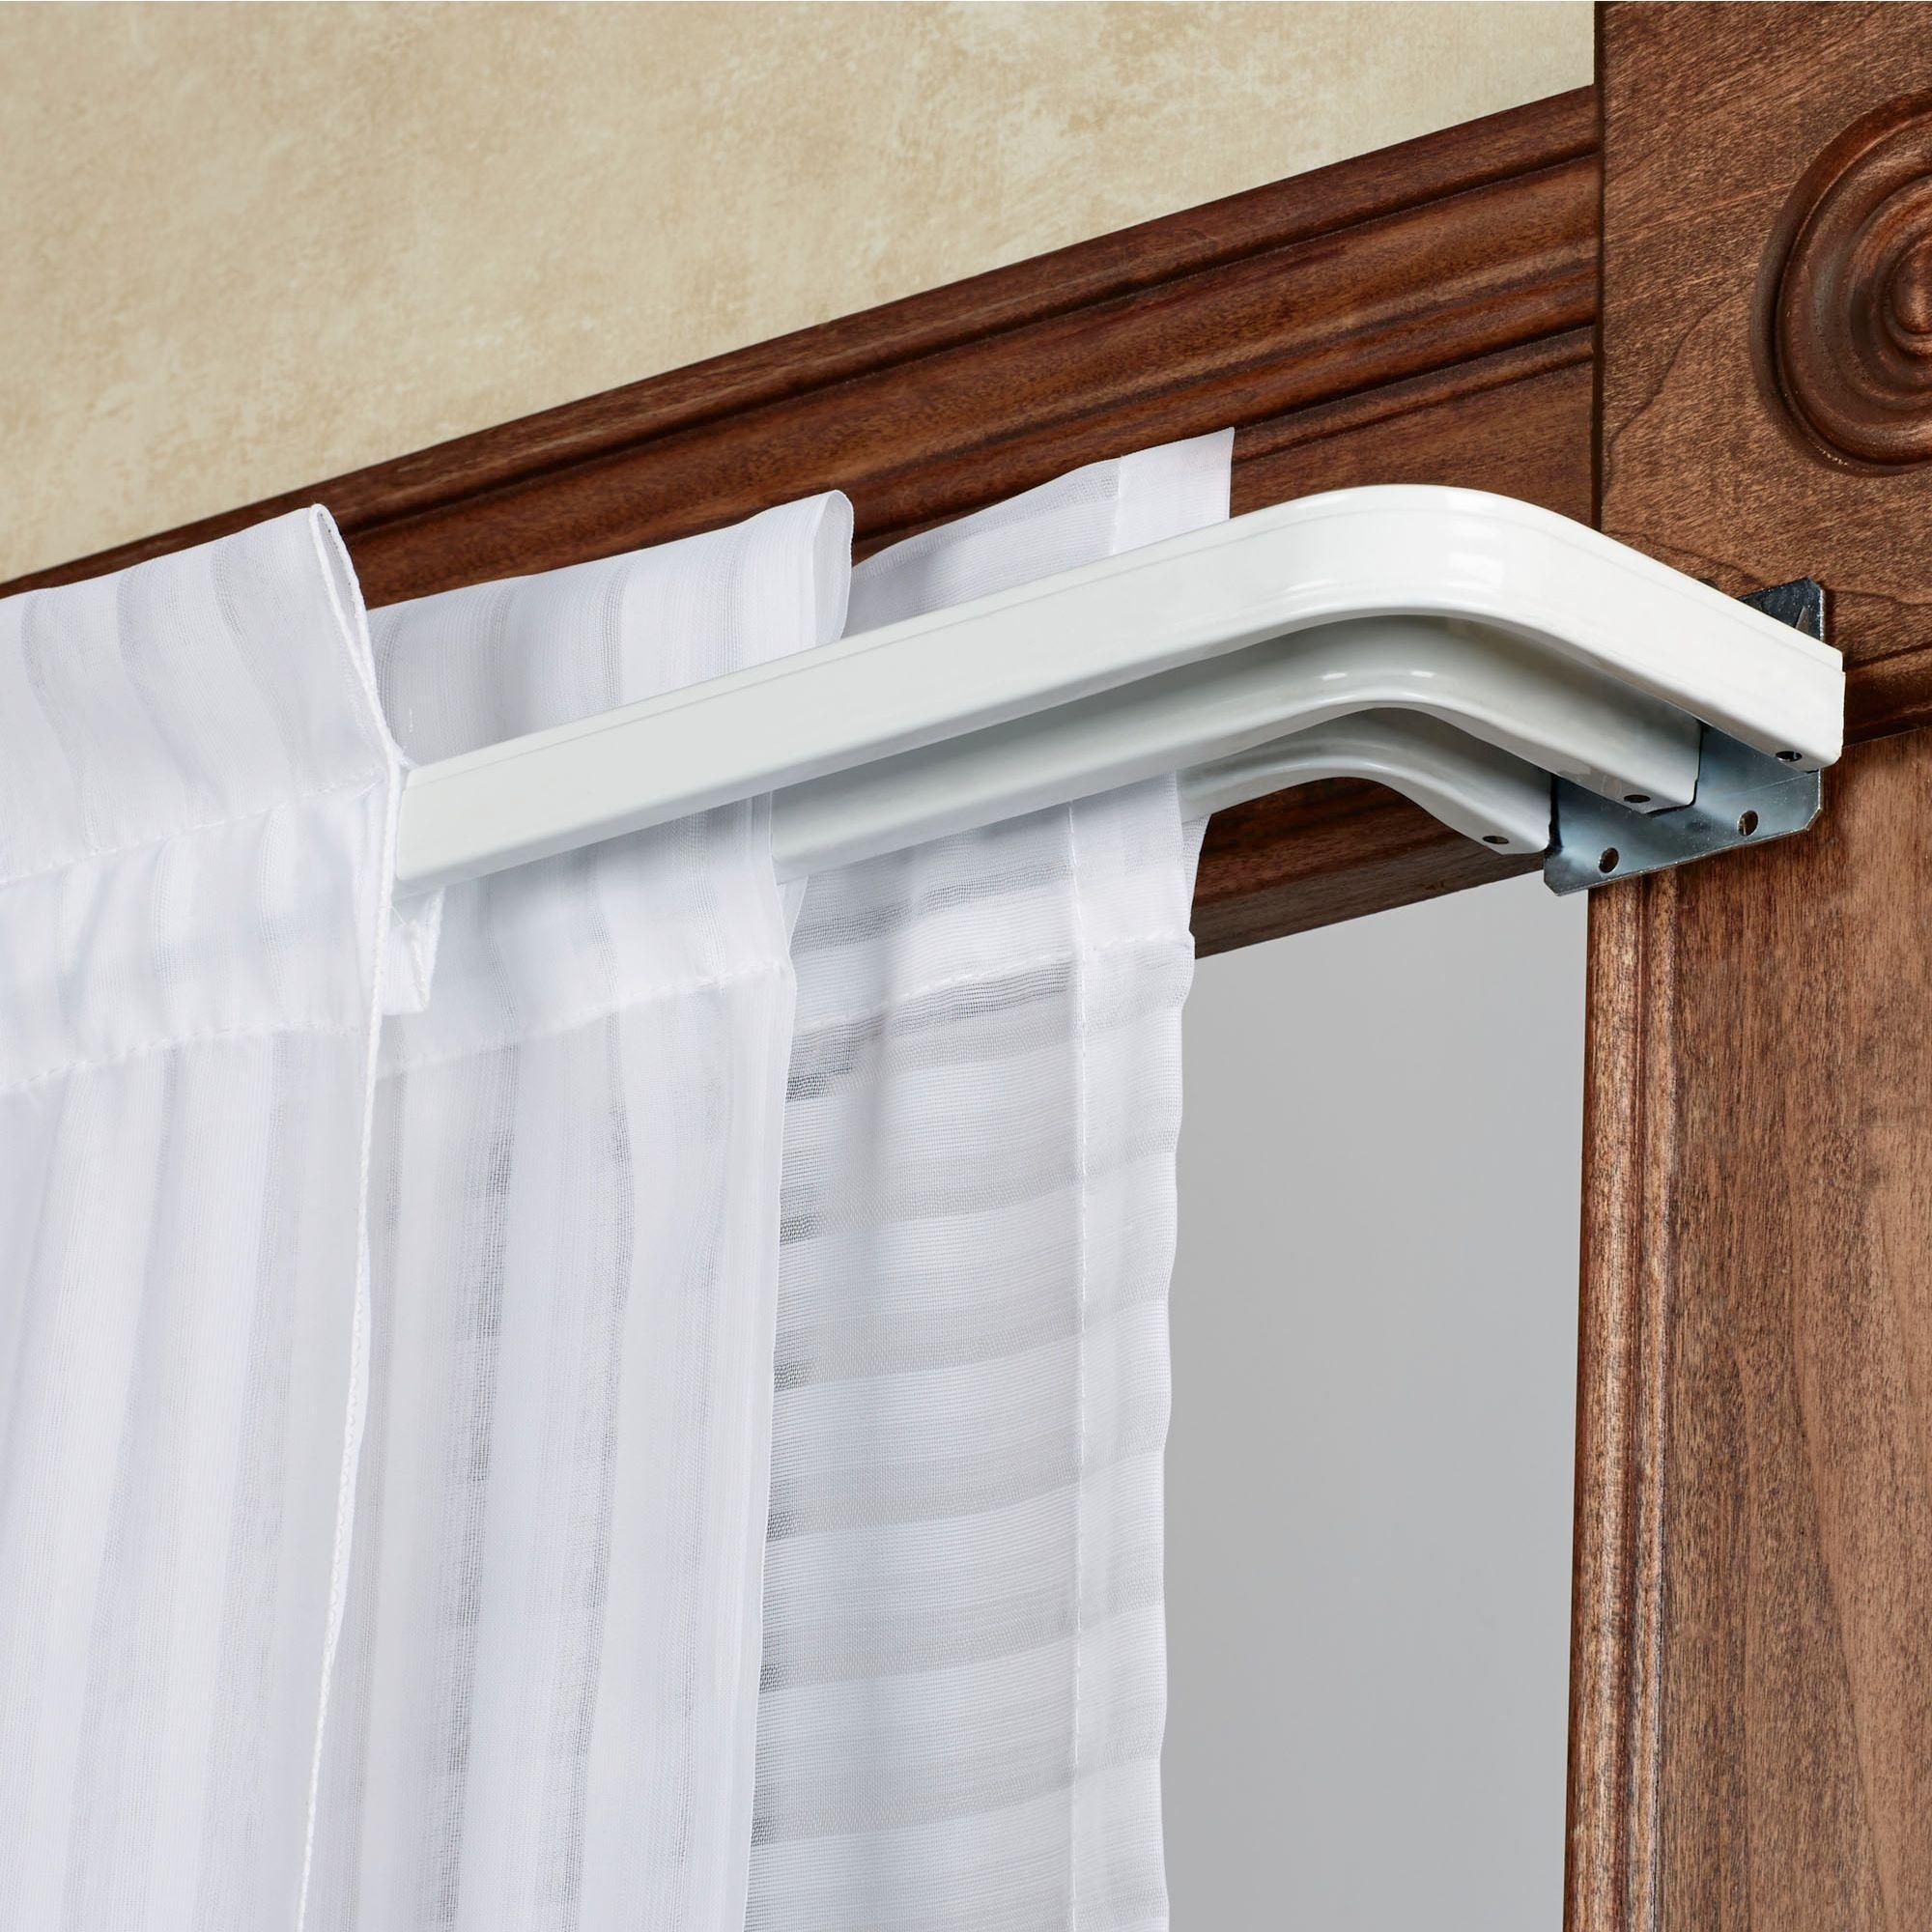 tripartite triple curtain rod set